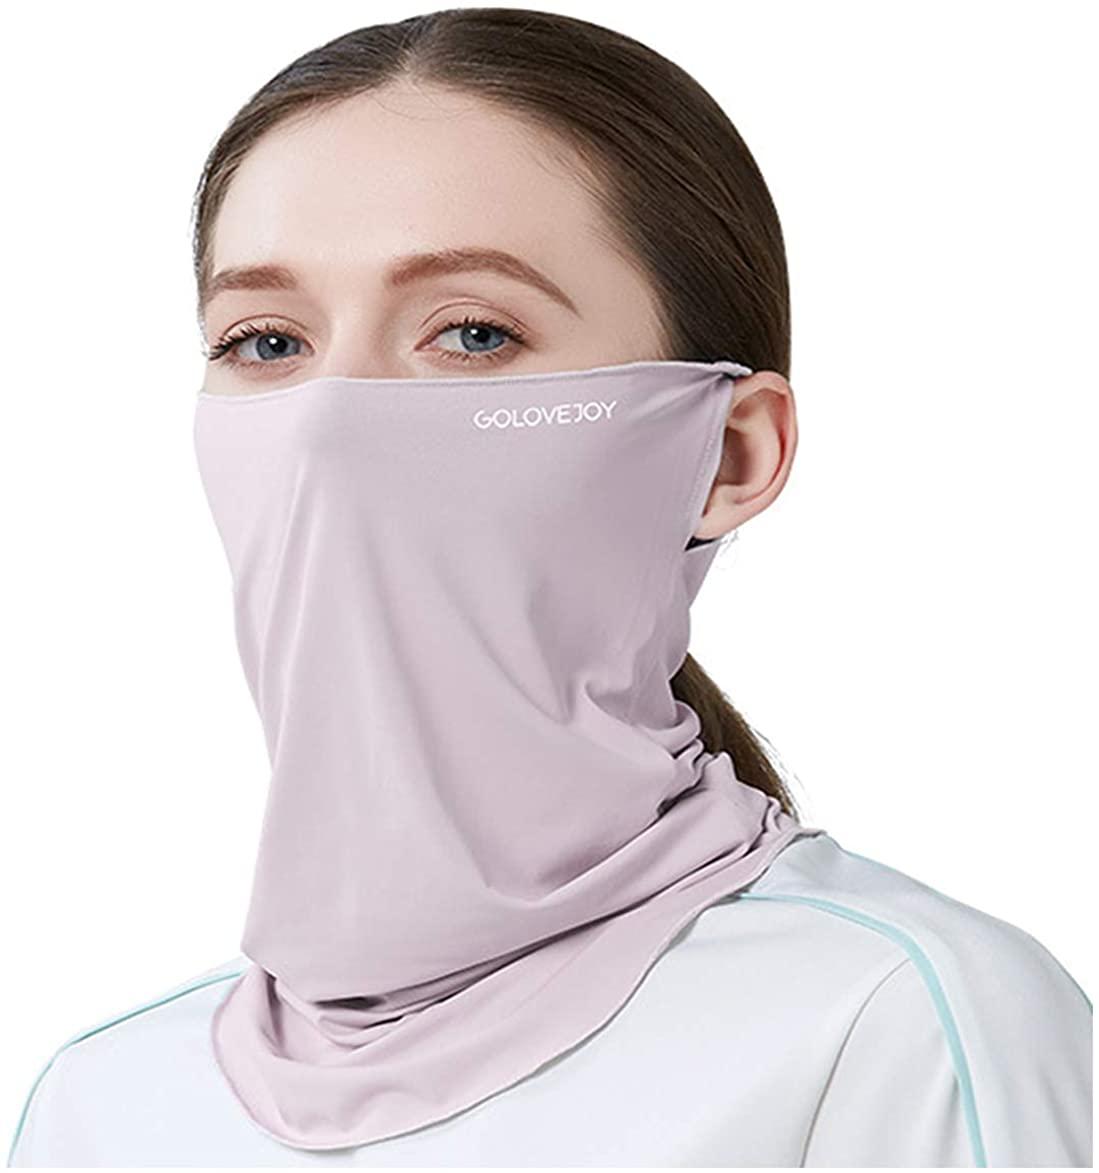 keland UV Protection Face Cover Mask Sunscreen Breathable Bandana Neck Gaiter Scarf for Hot Summer Sport&Outdoor